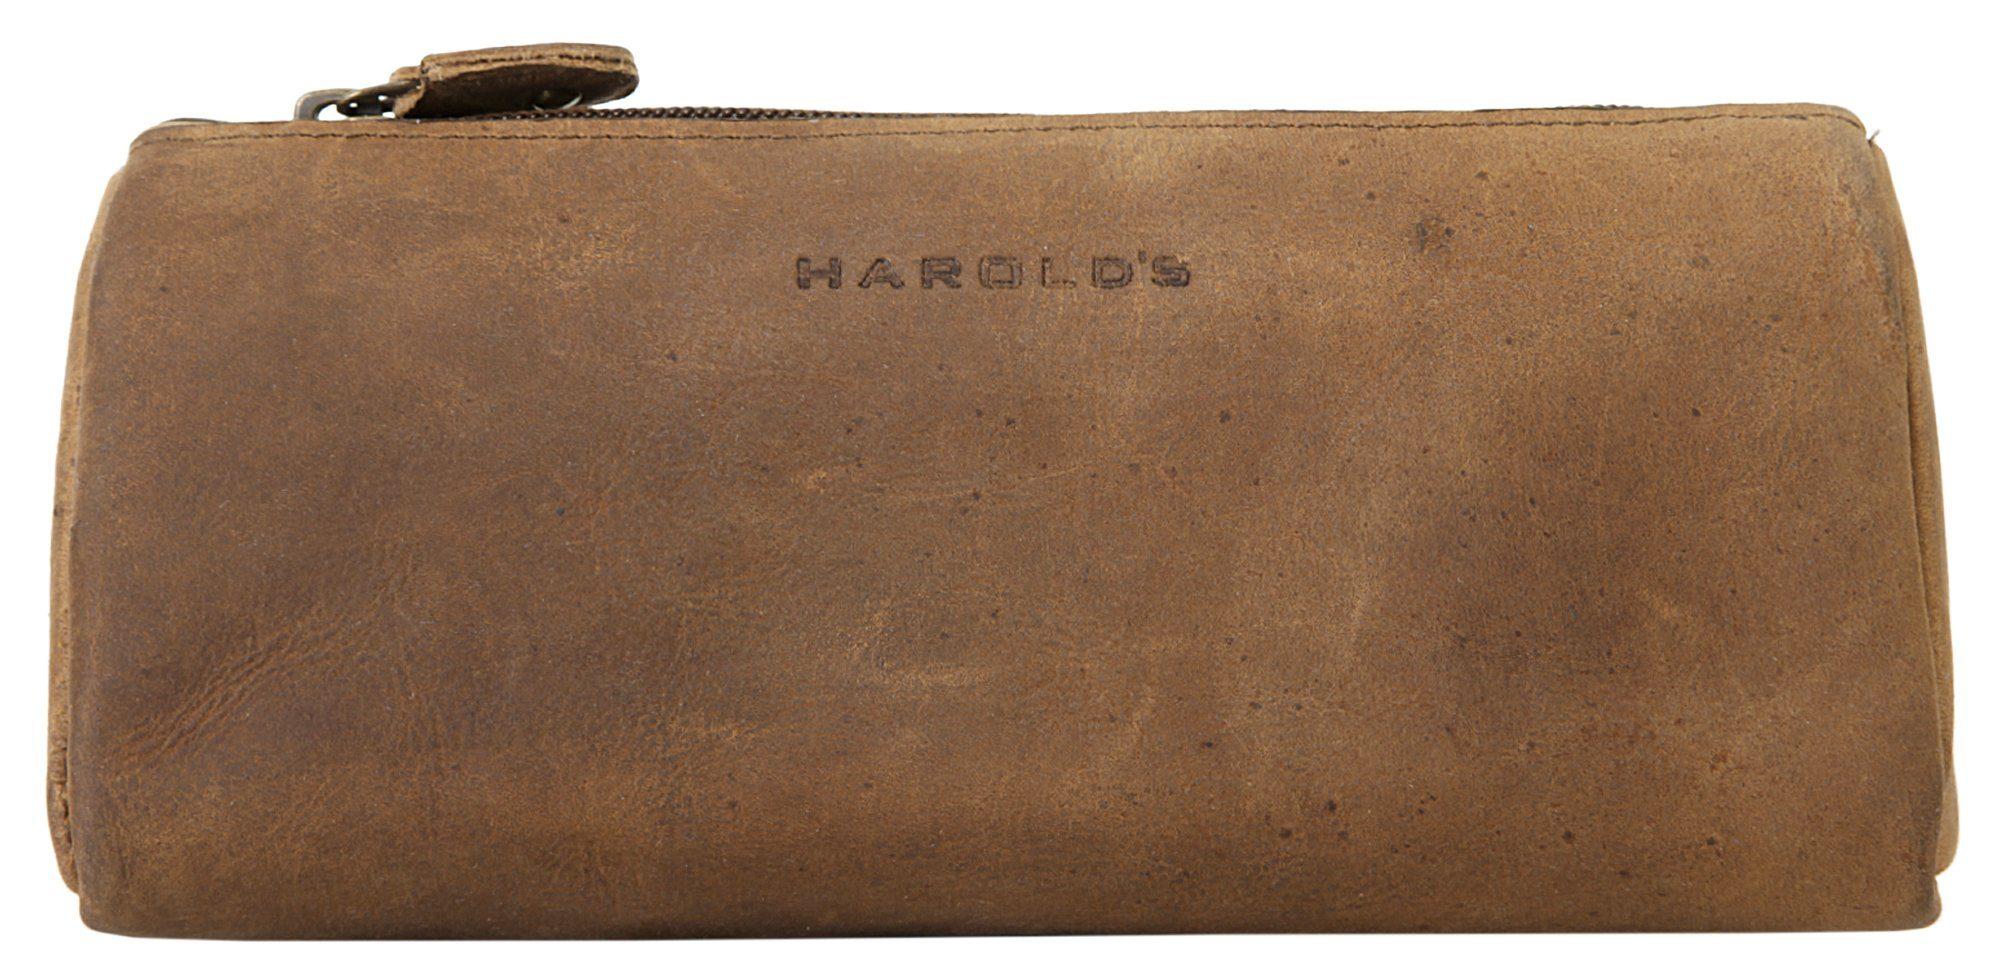 Harold's Brieftasche